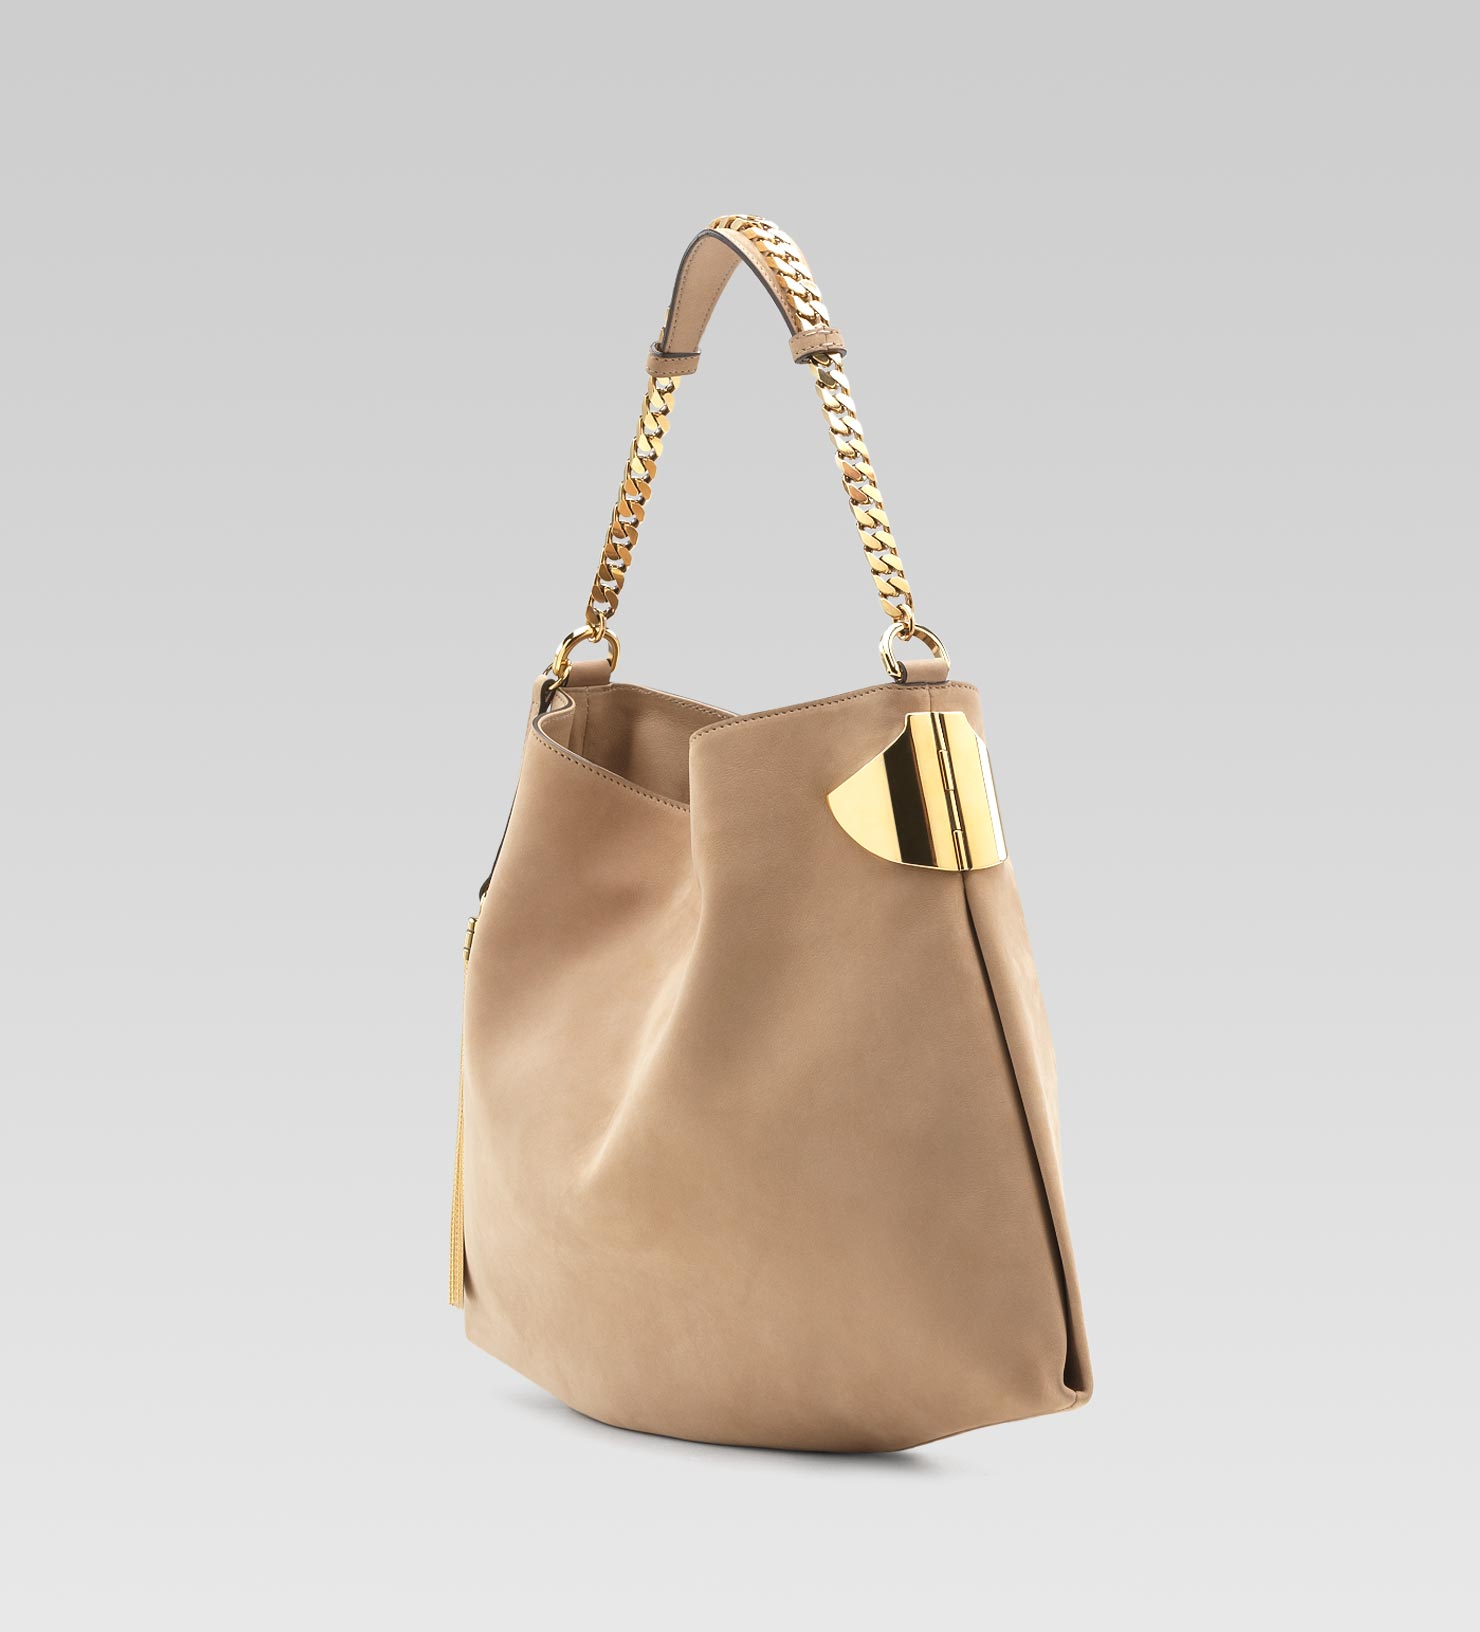 Gucci Gucci Shoulder Bag in Natural : Lyst